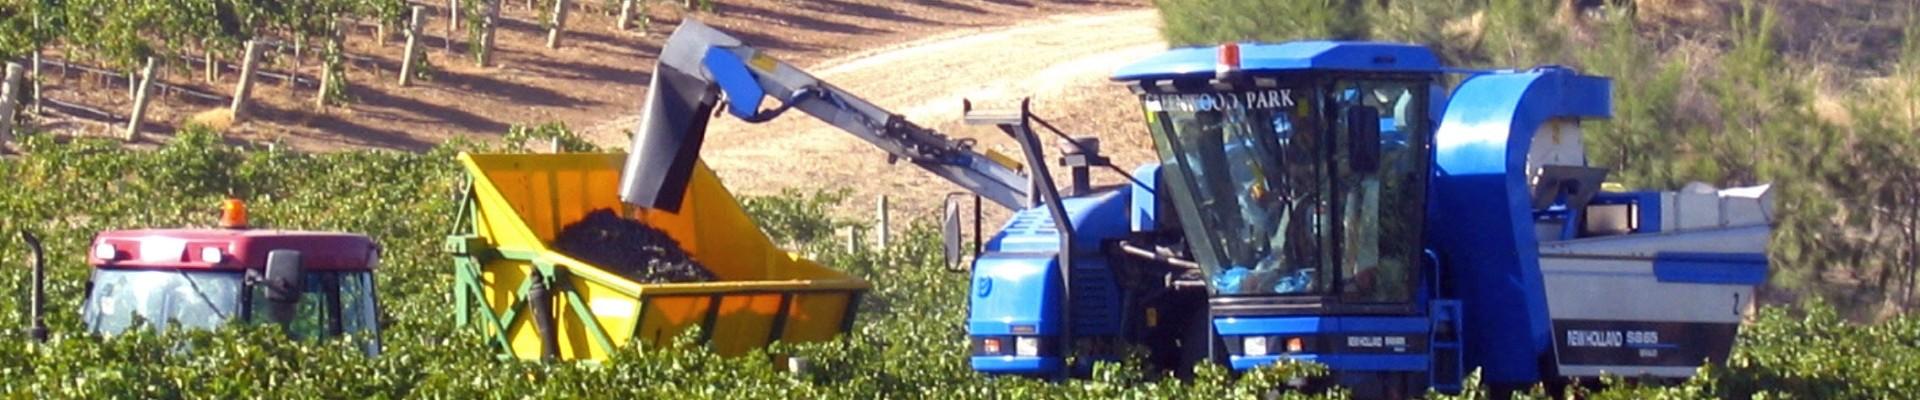 Machine Harvesting - Ackland Harvesting